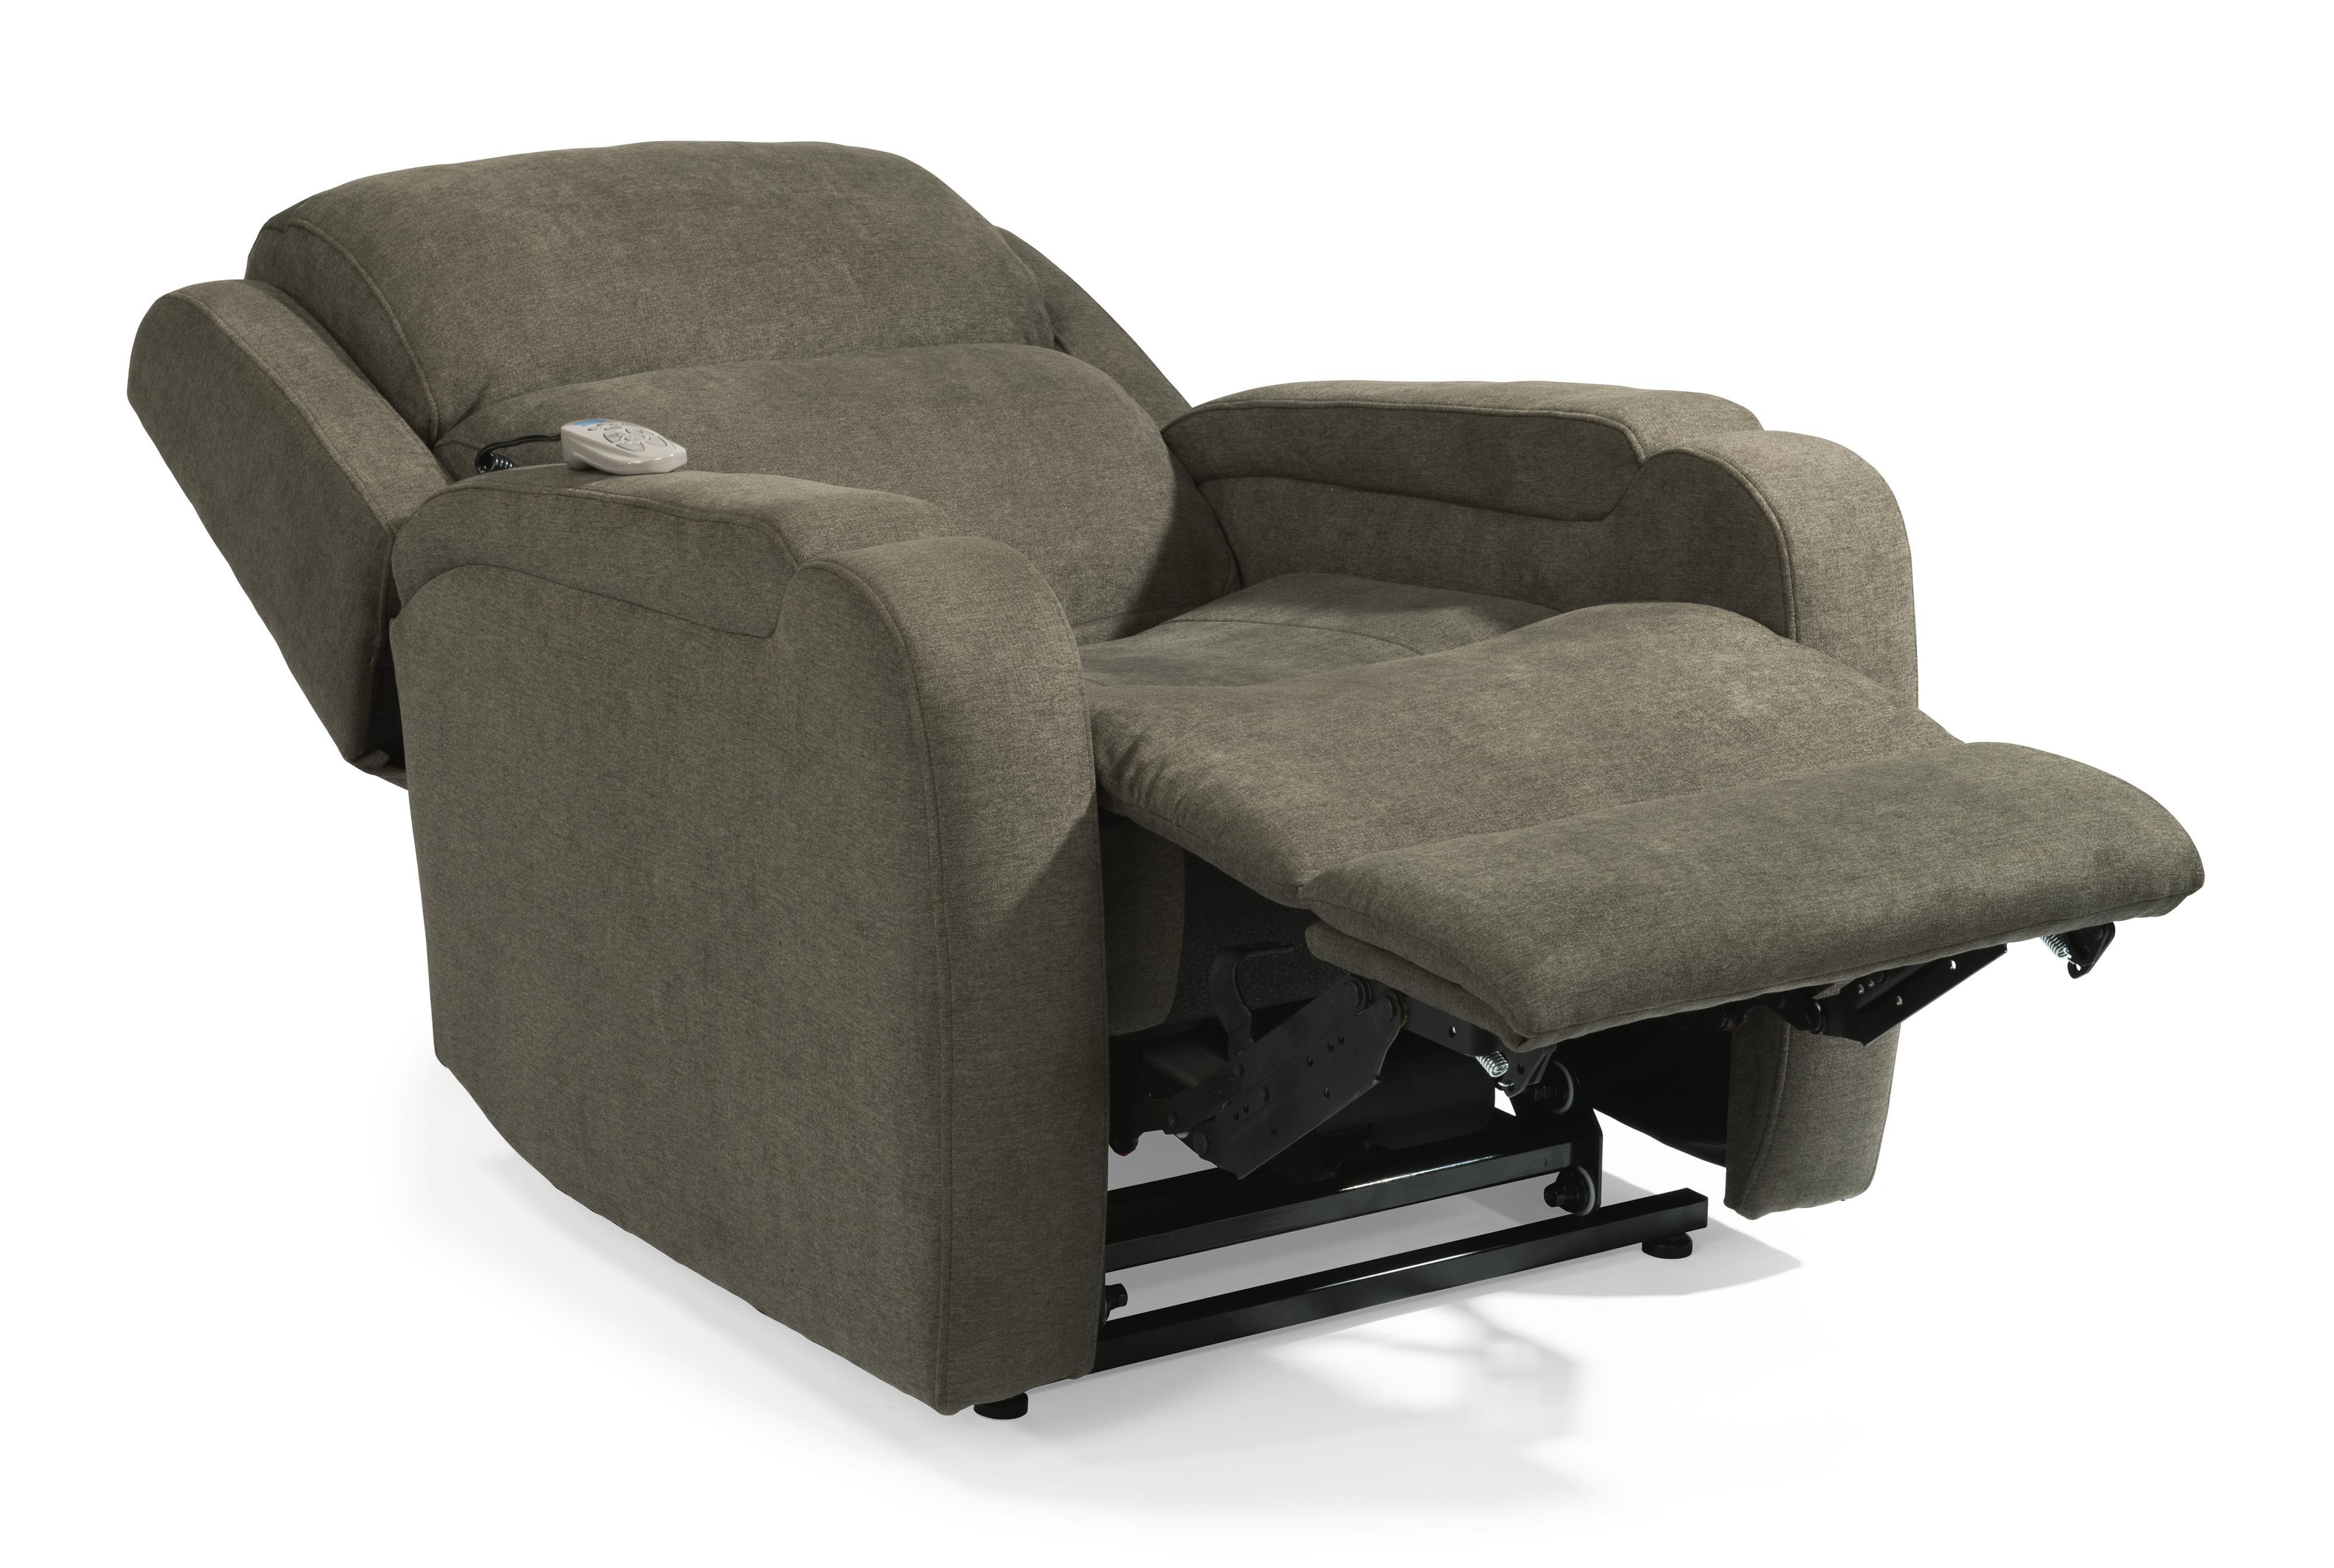 Flexsteel Latitudes Lift Chairs 1902 55 Melody Infinite